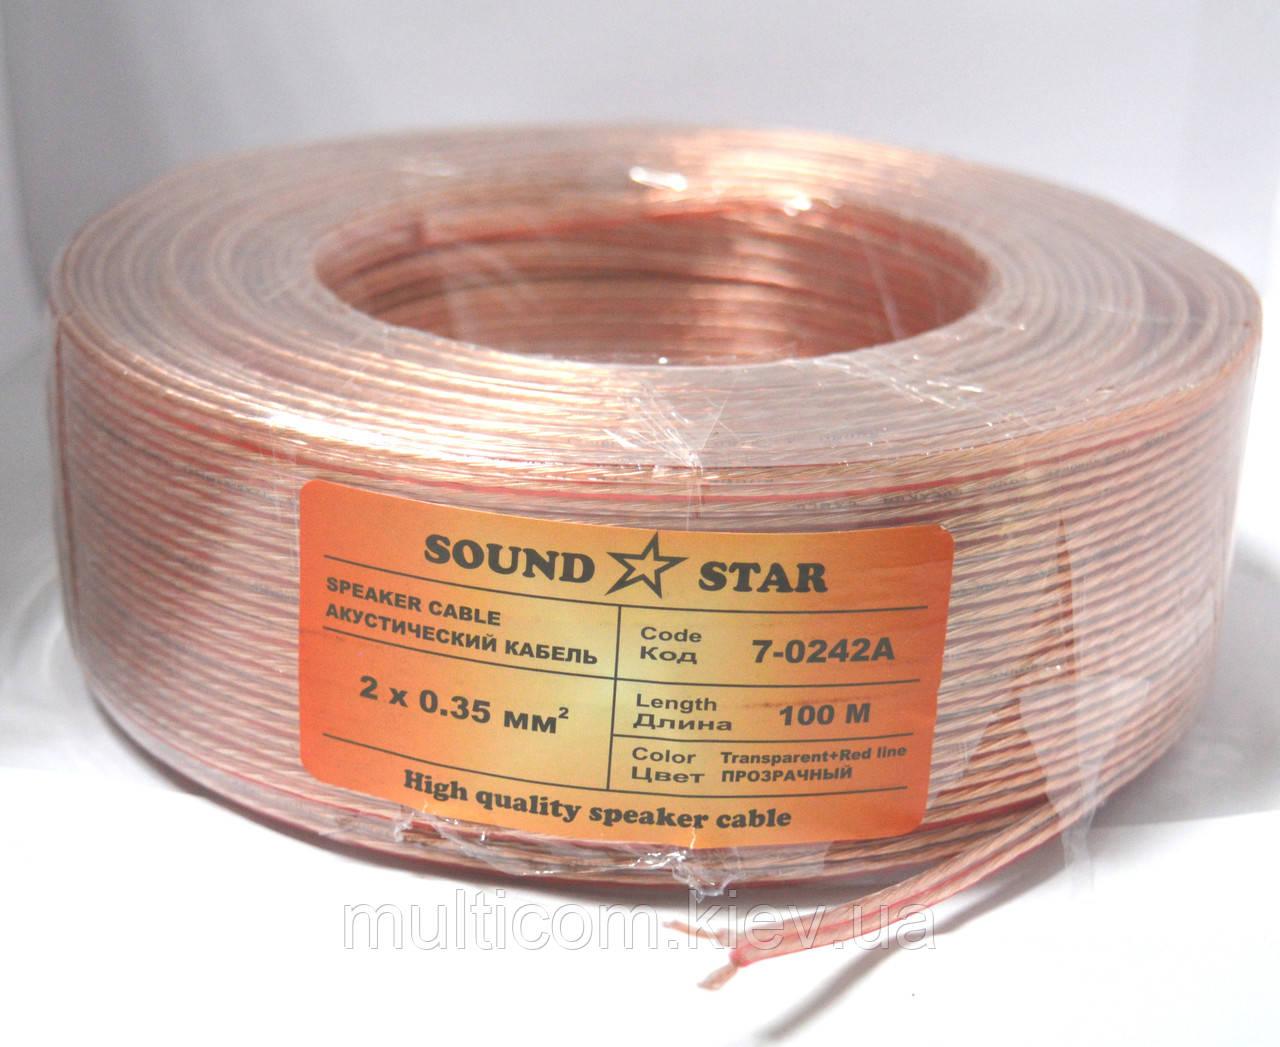 07-03-037. Кабель акустический 2х0,35мм², CCA, прозрачно-розовый, 100м